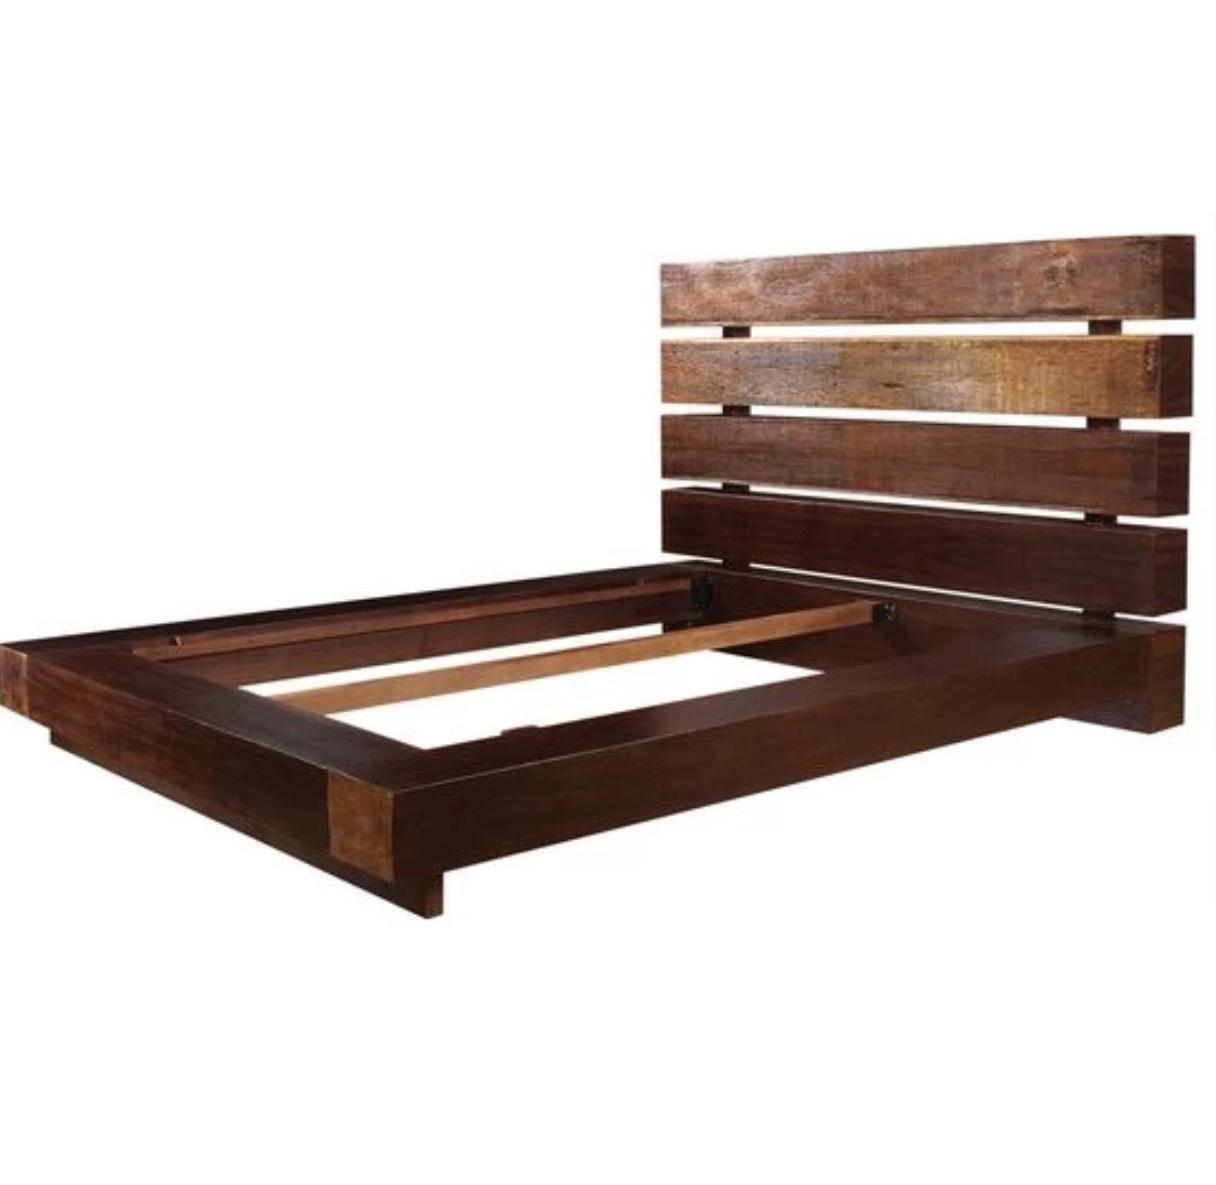 Reclaimed Queen Platform Bed By Four Hands King Platform Bed